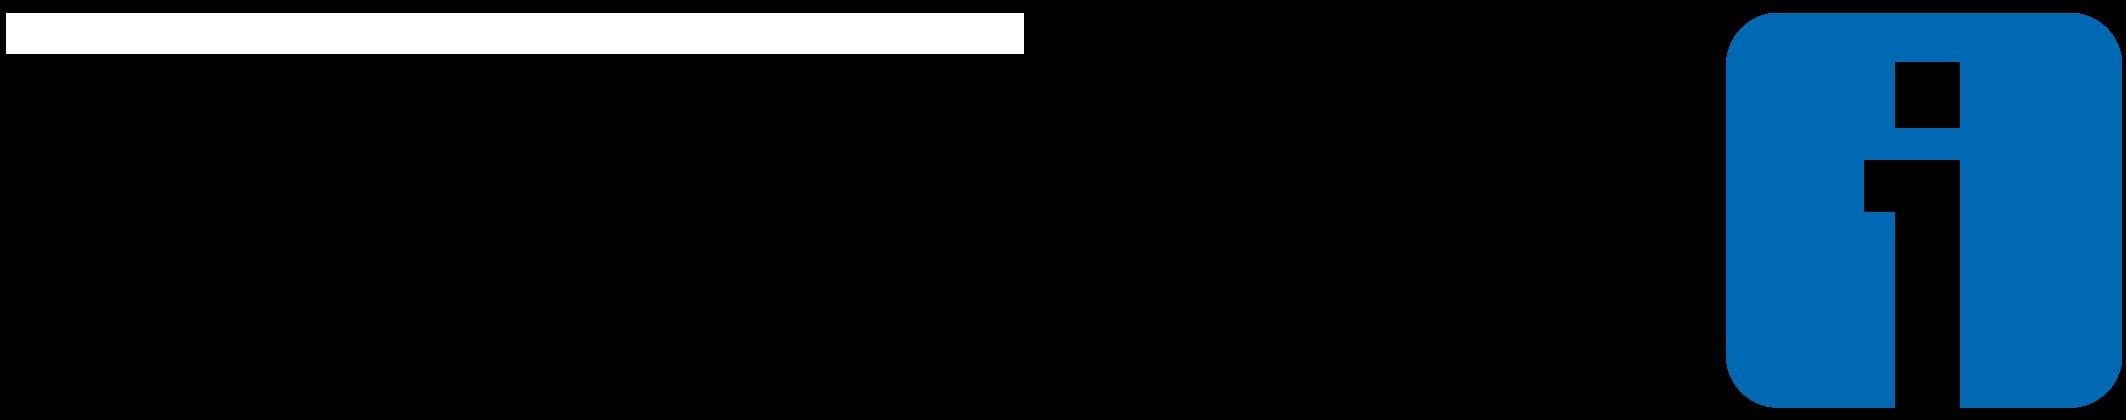 Infoland Community Logo